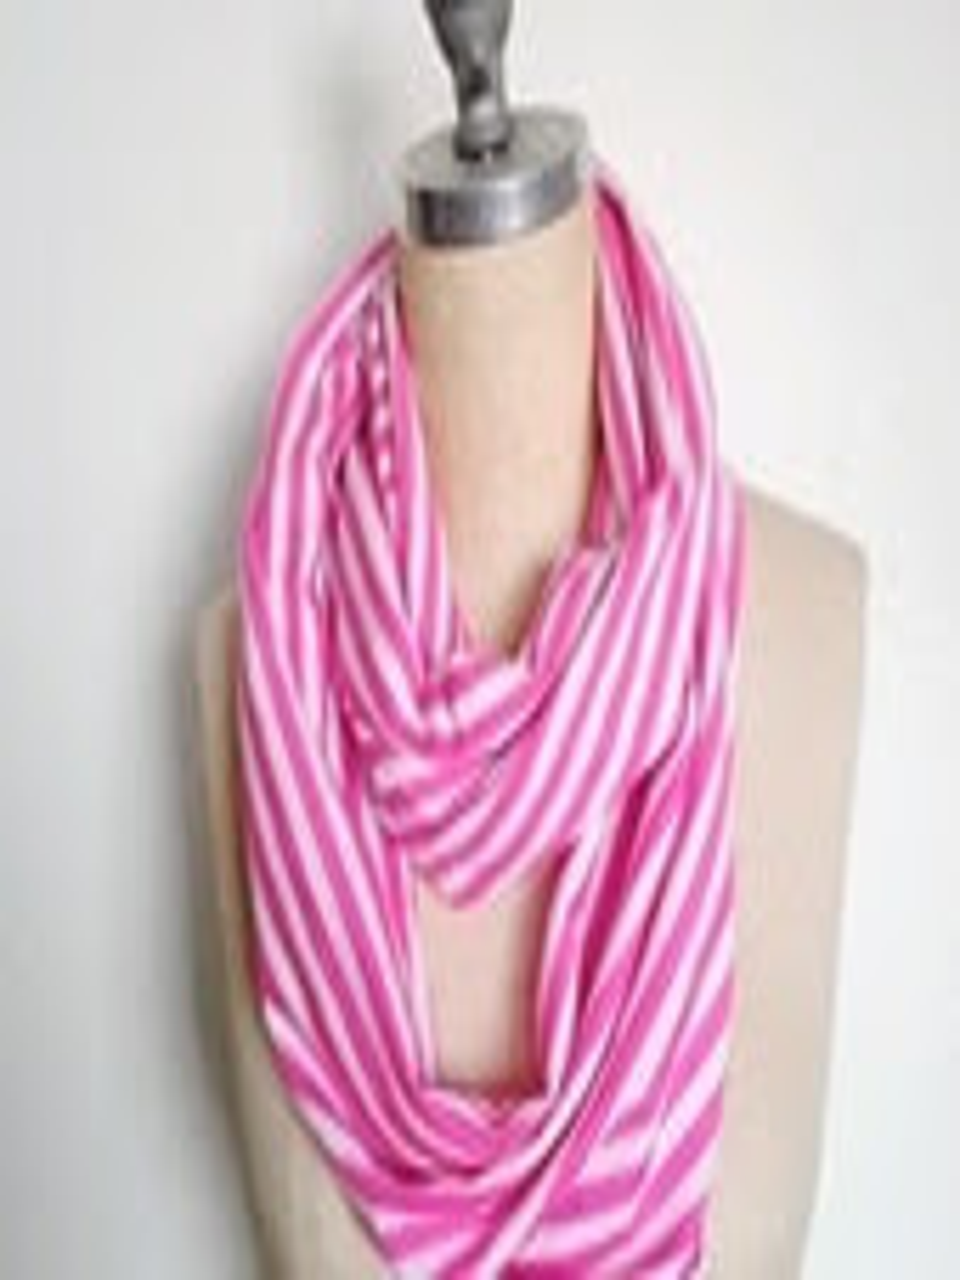 Jersey Infinity Circle Scarf Light Weight White and Pink Stripe - SevenWhiteRabbits